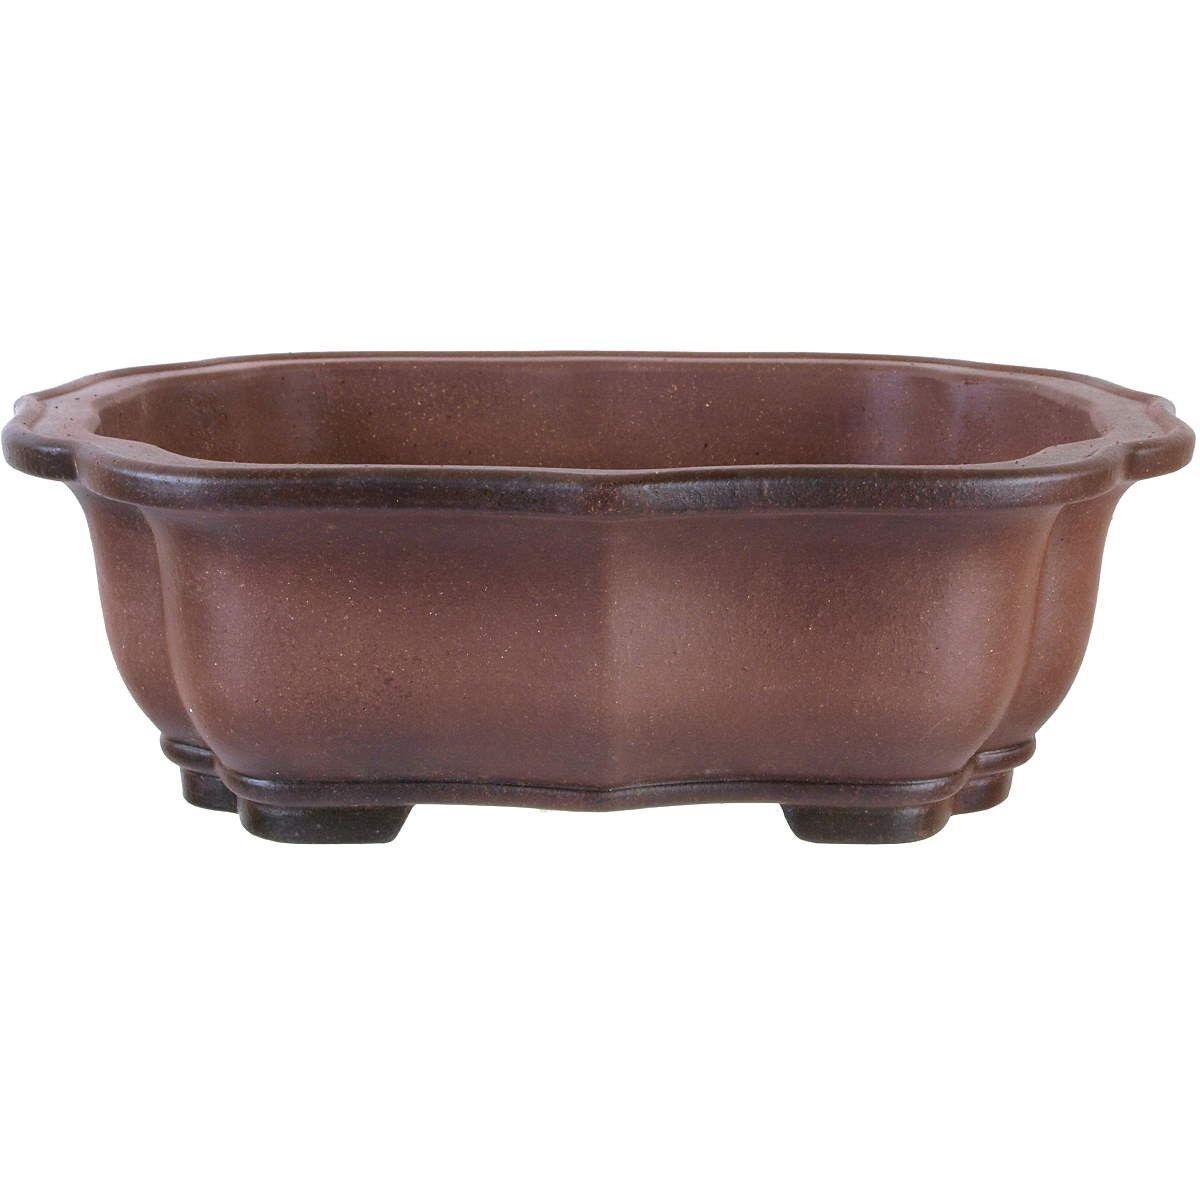 Vaso bonsai 39.5x32.5x12.5cm Marroneee anticato forma lotus in grès H40885AB